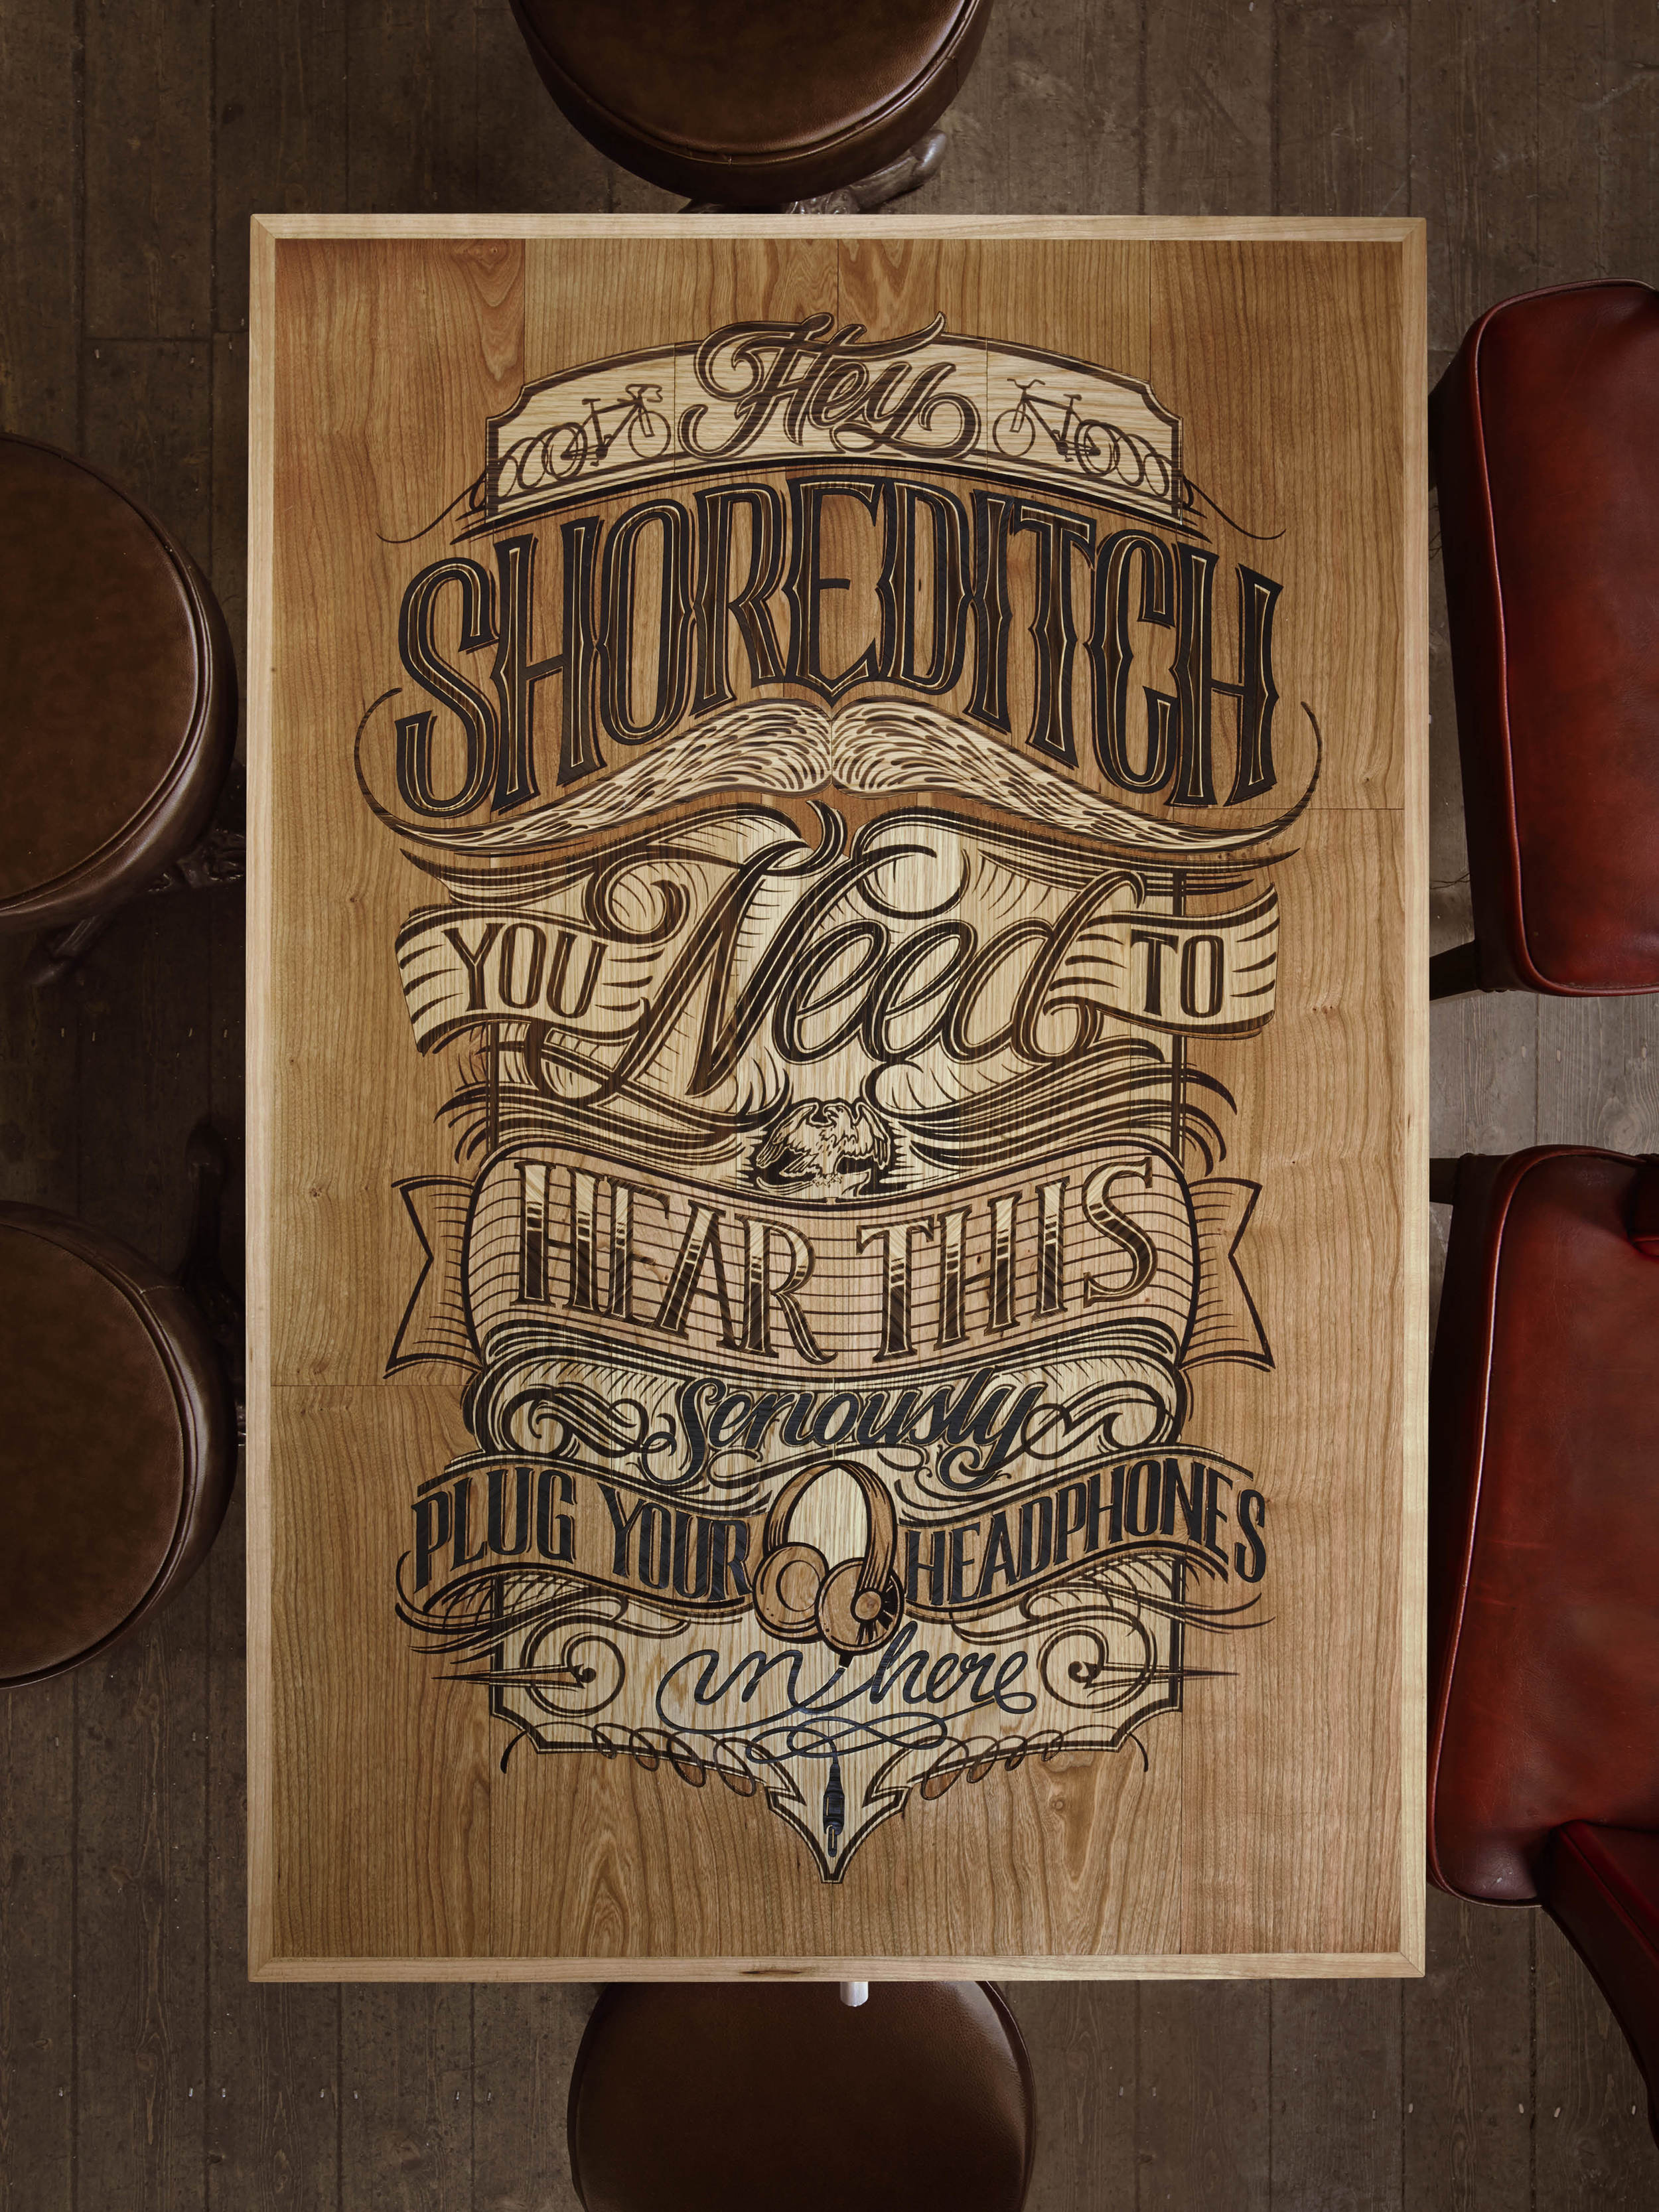 ShoreditchFull.jpg